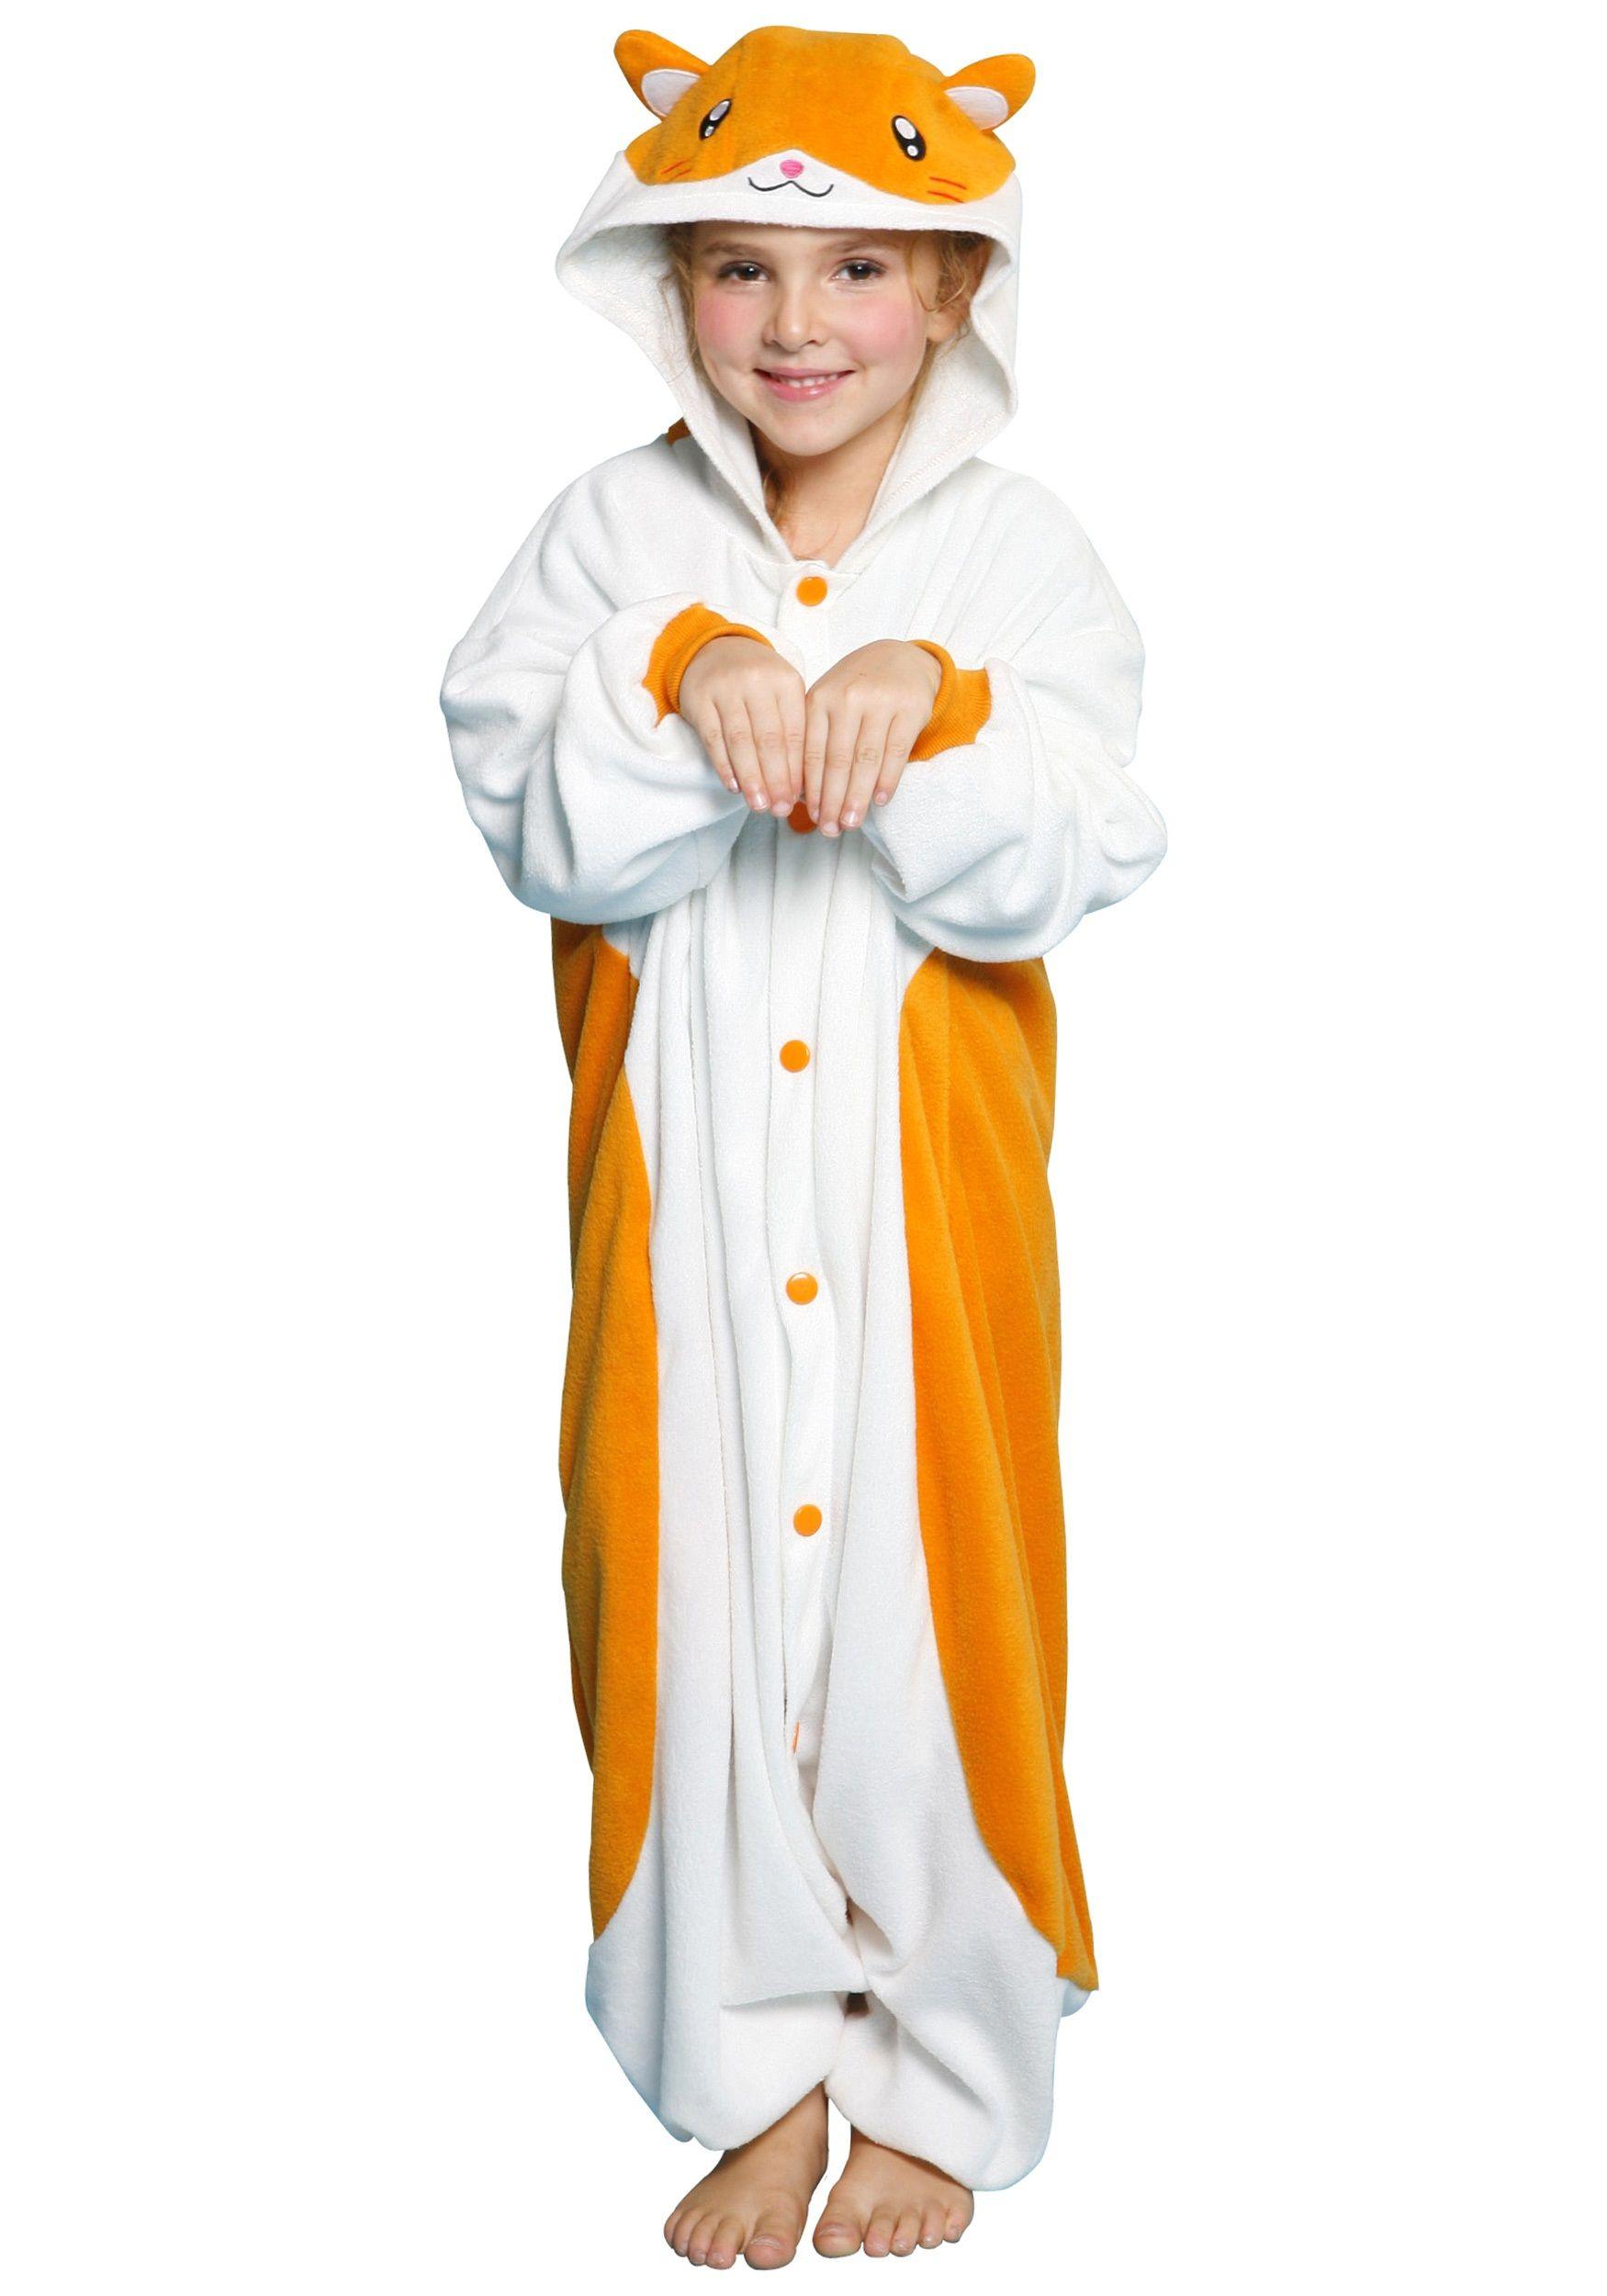 Kids Hamster Pajama Costume | Crafts | Pinterest | Costumes ...